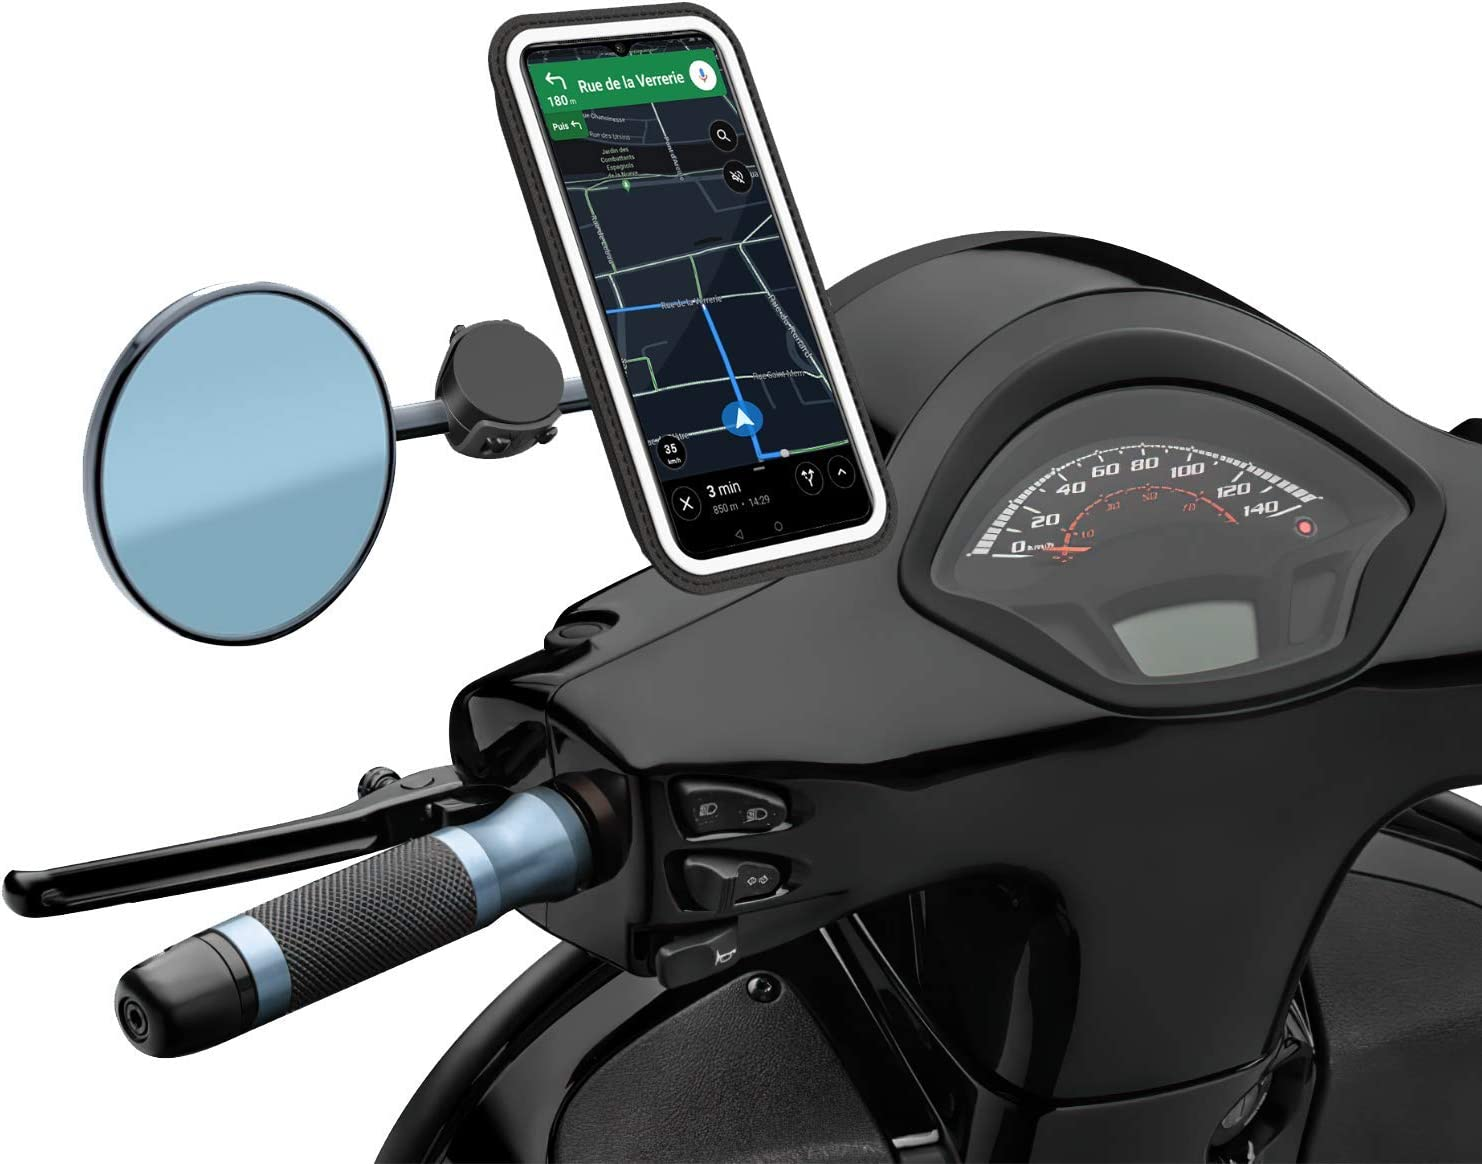 Shapeheart Soporte Movil Magnético para Scooter, Talla XL, Smartphone hasta 16.8cm